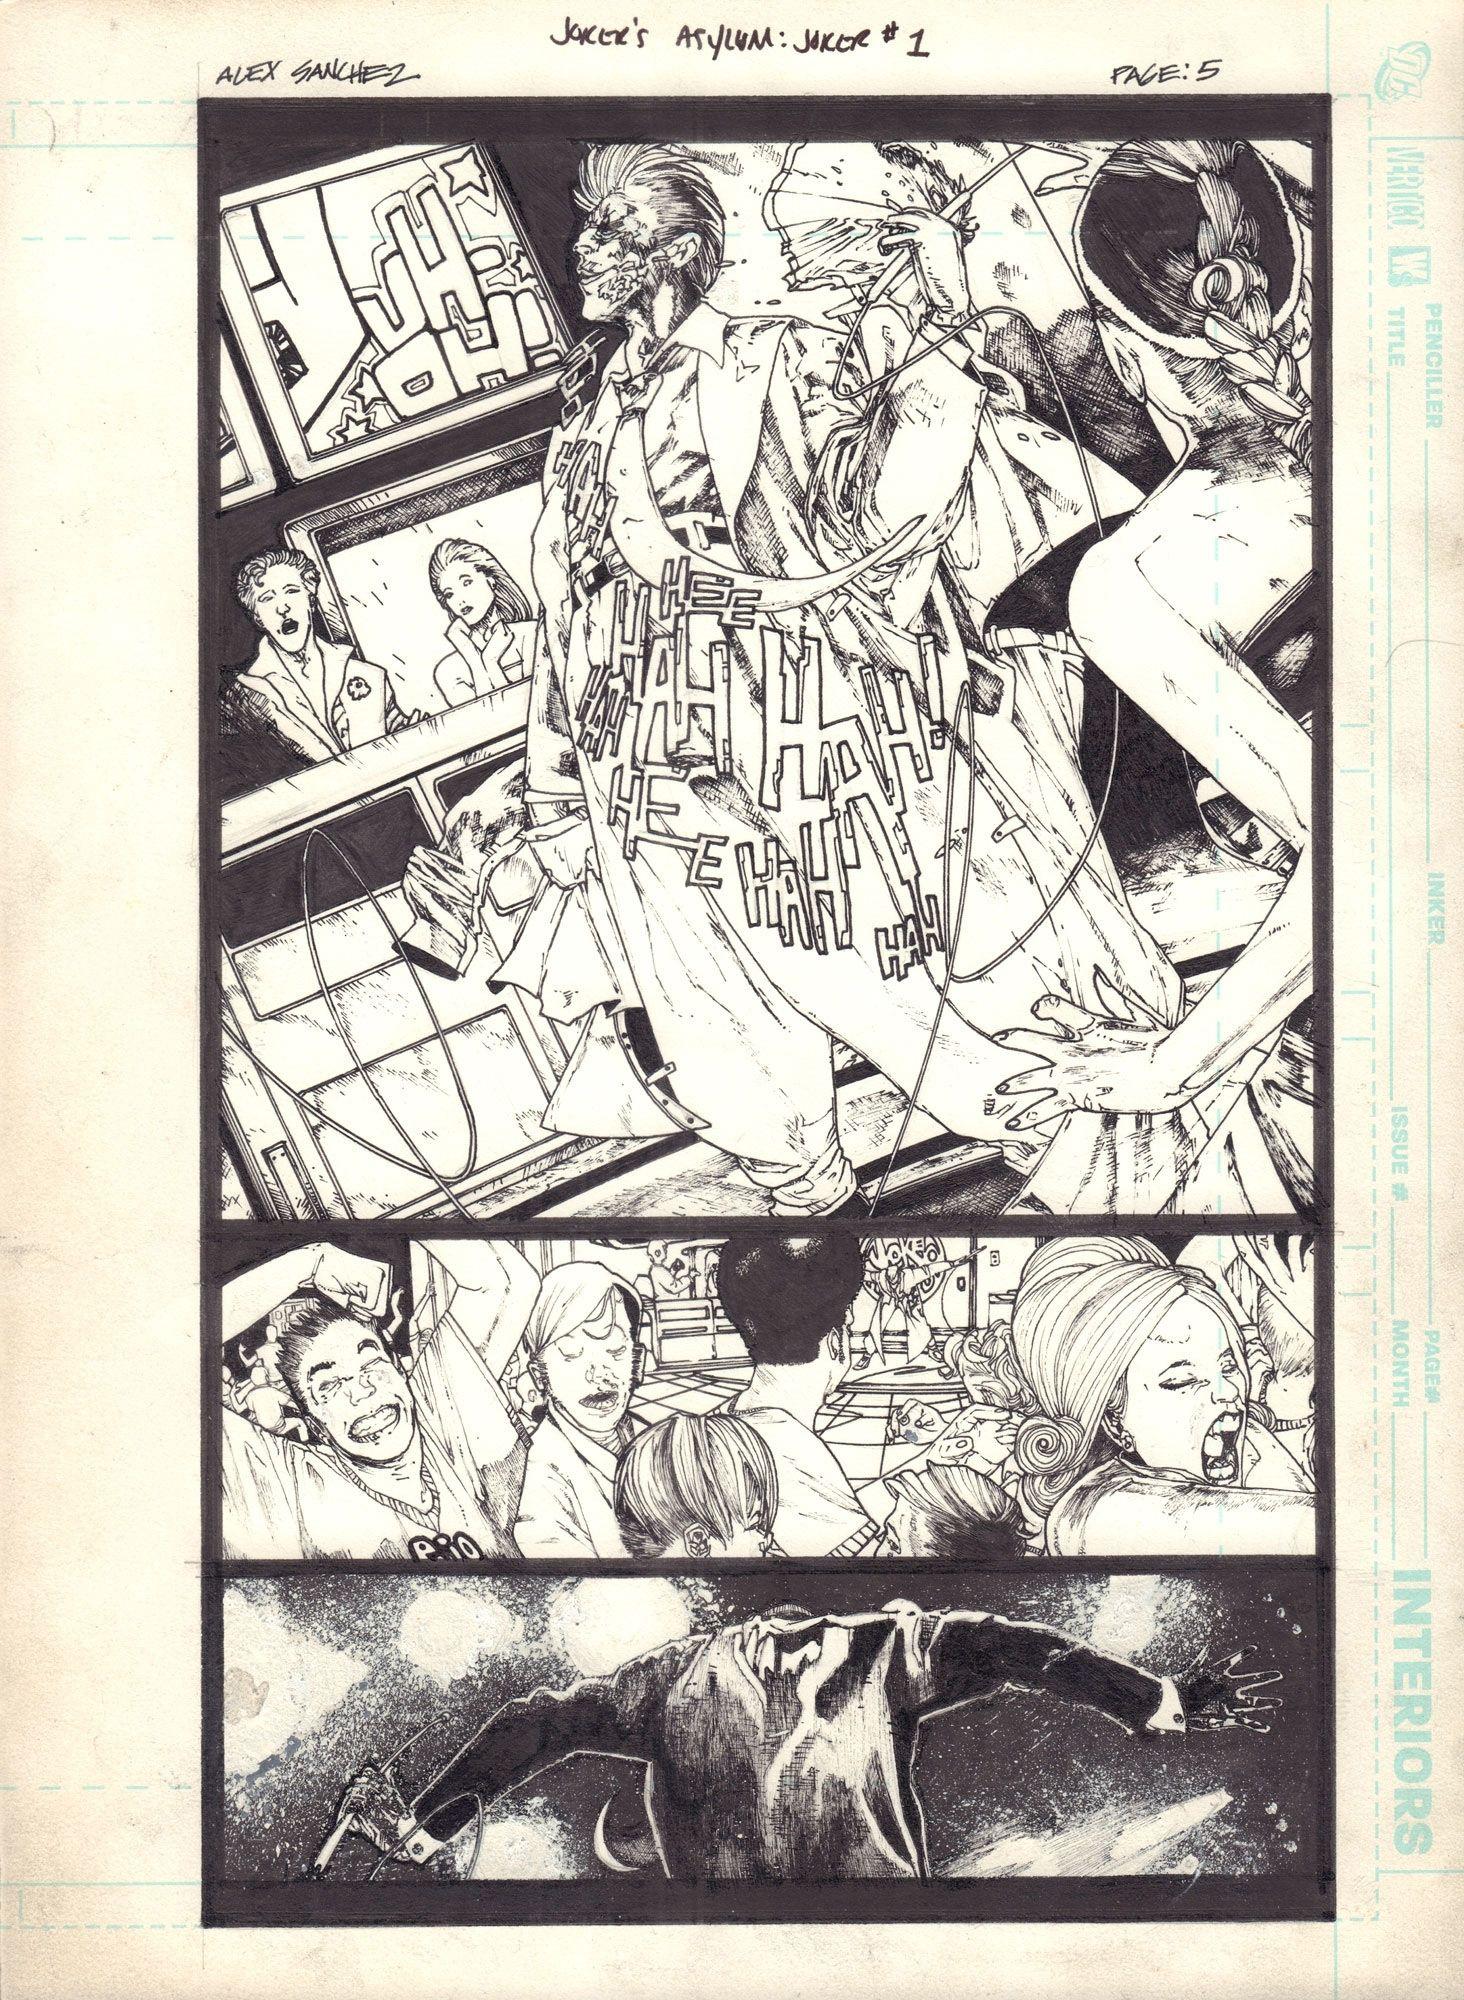 Joker's Asylum: The Joker, s. 5